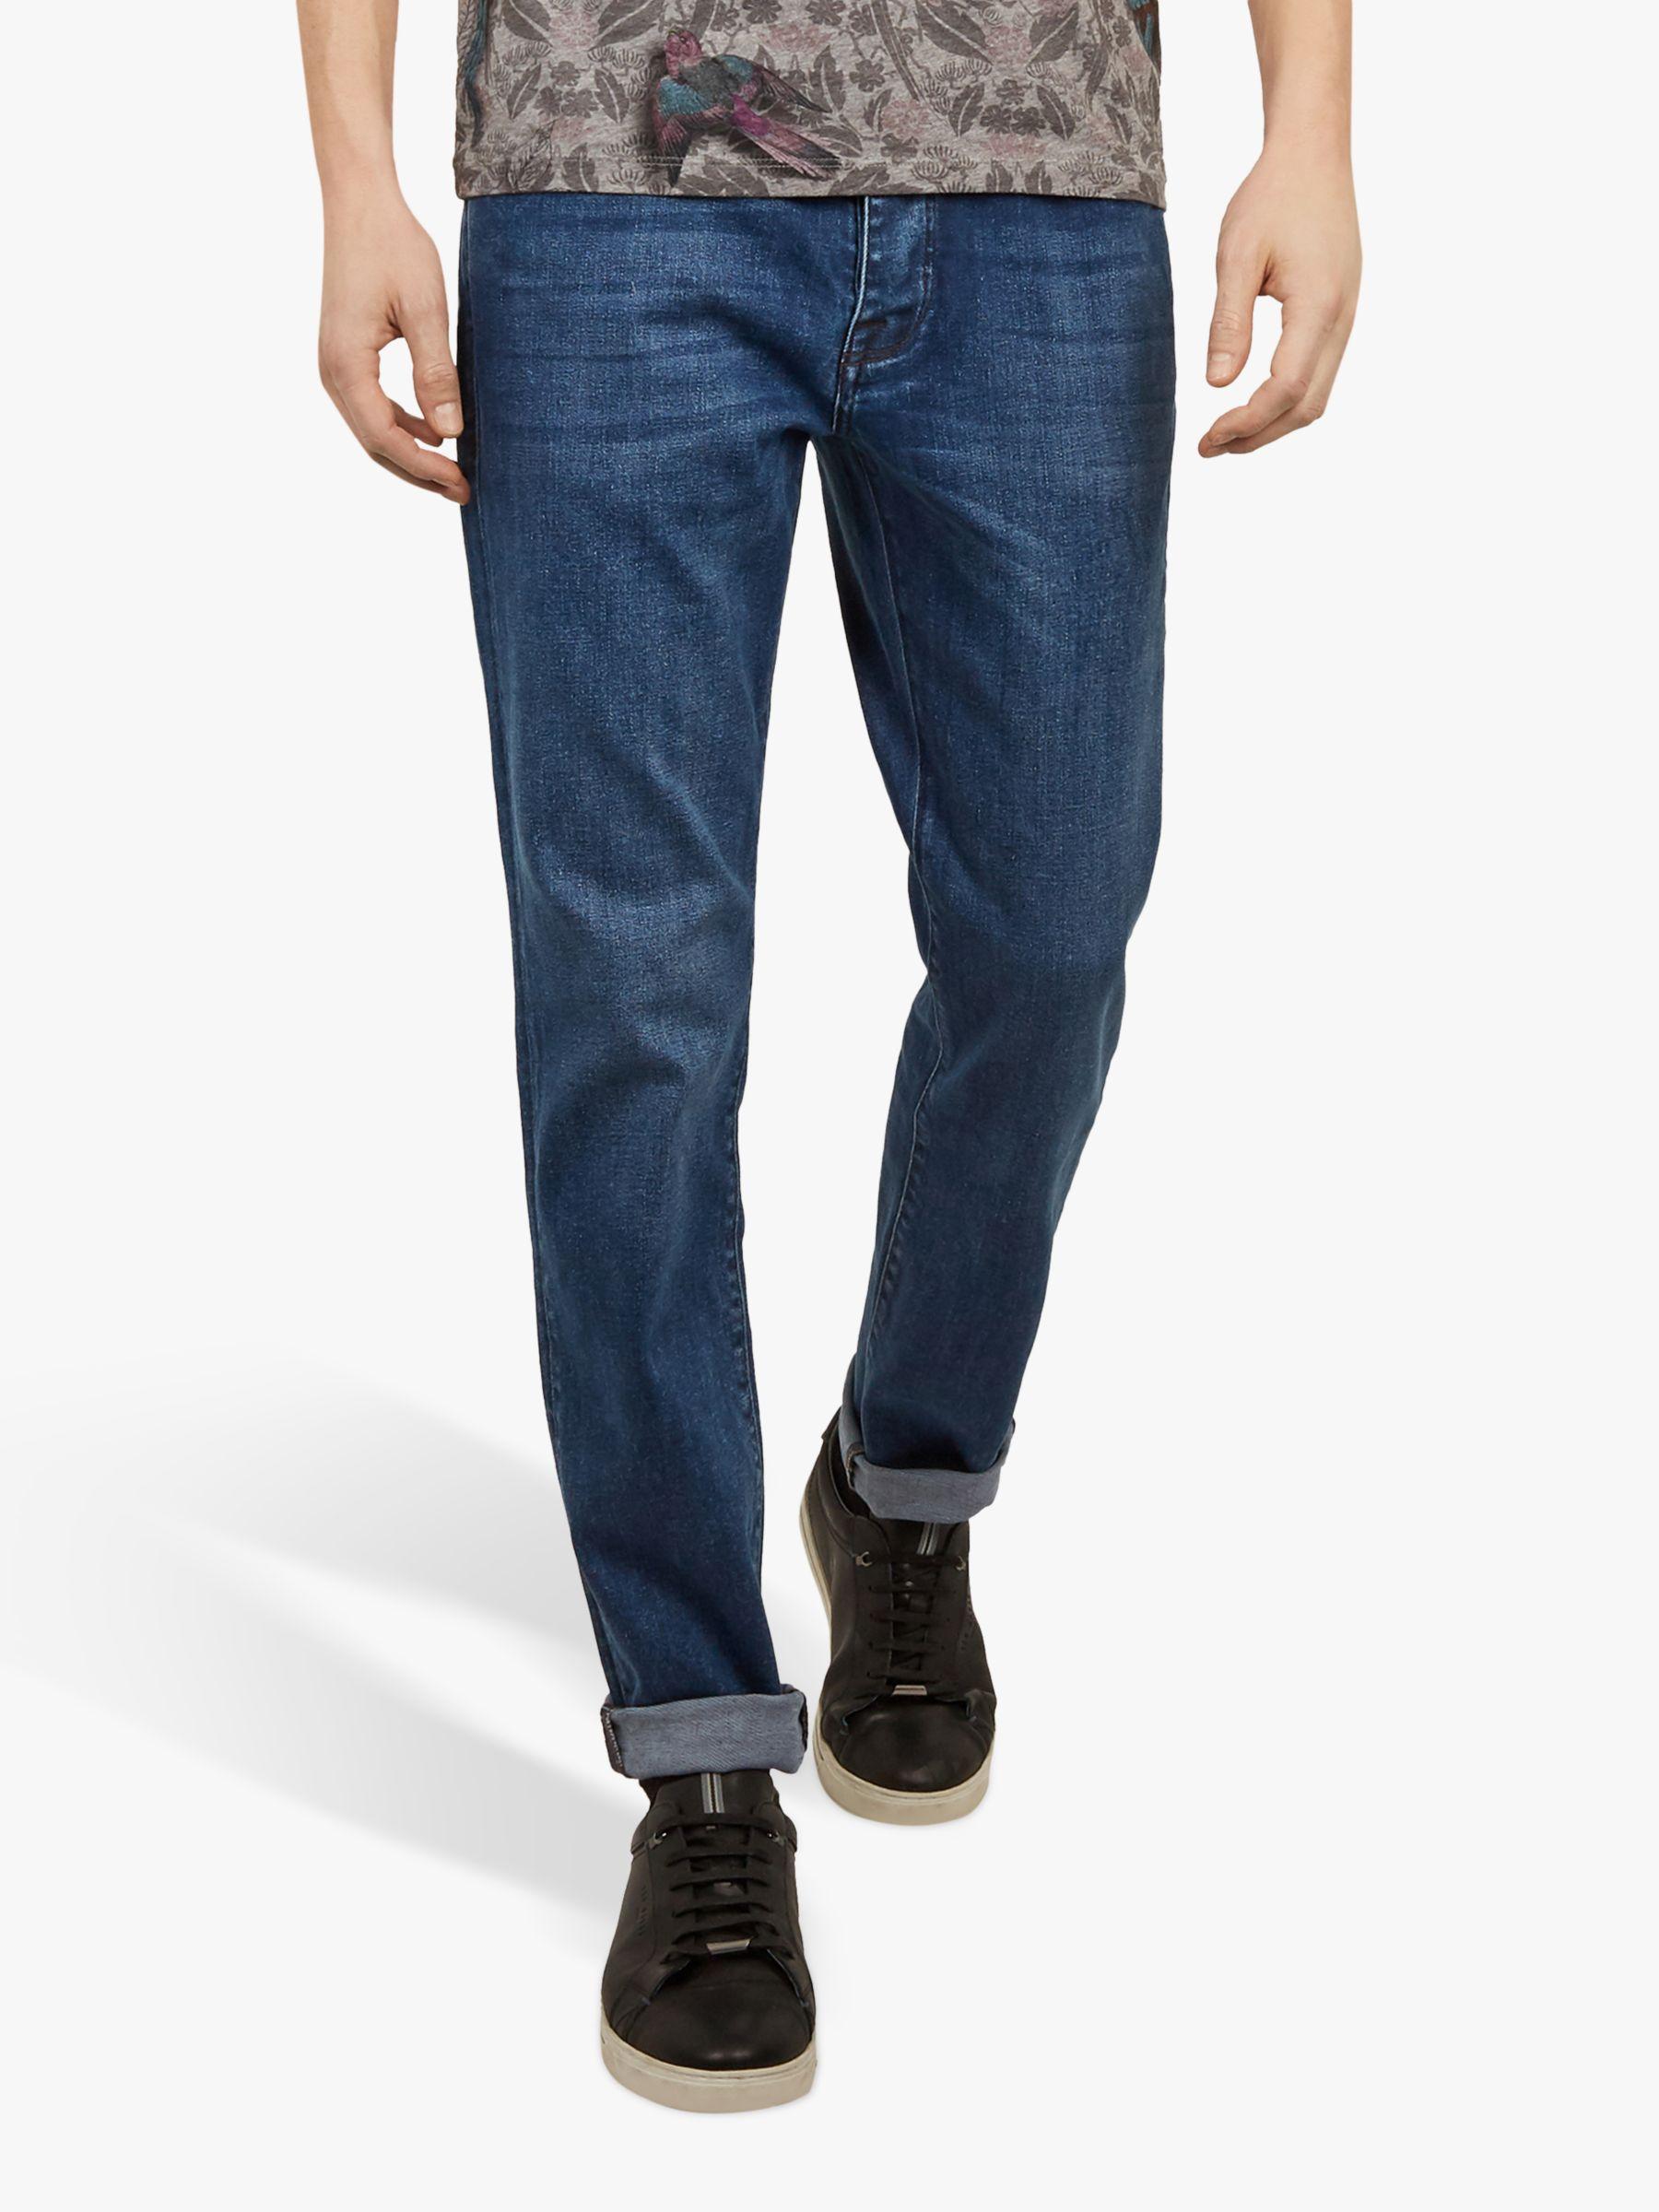 83d1715a149e Ted Baker Breezie Straight Leg Jeans in Blue for Men - Lyst